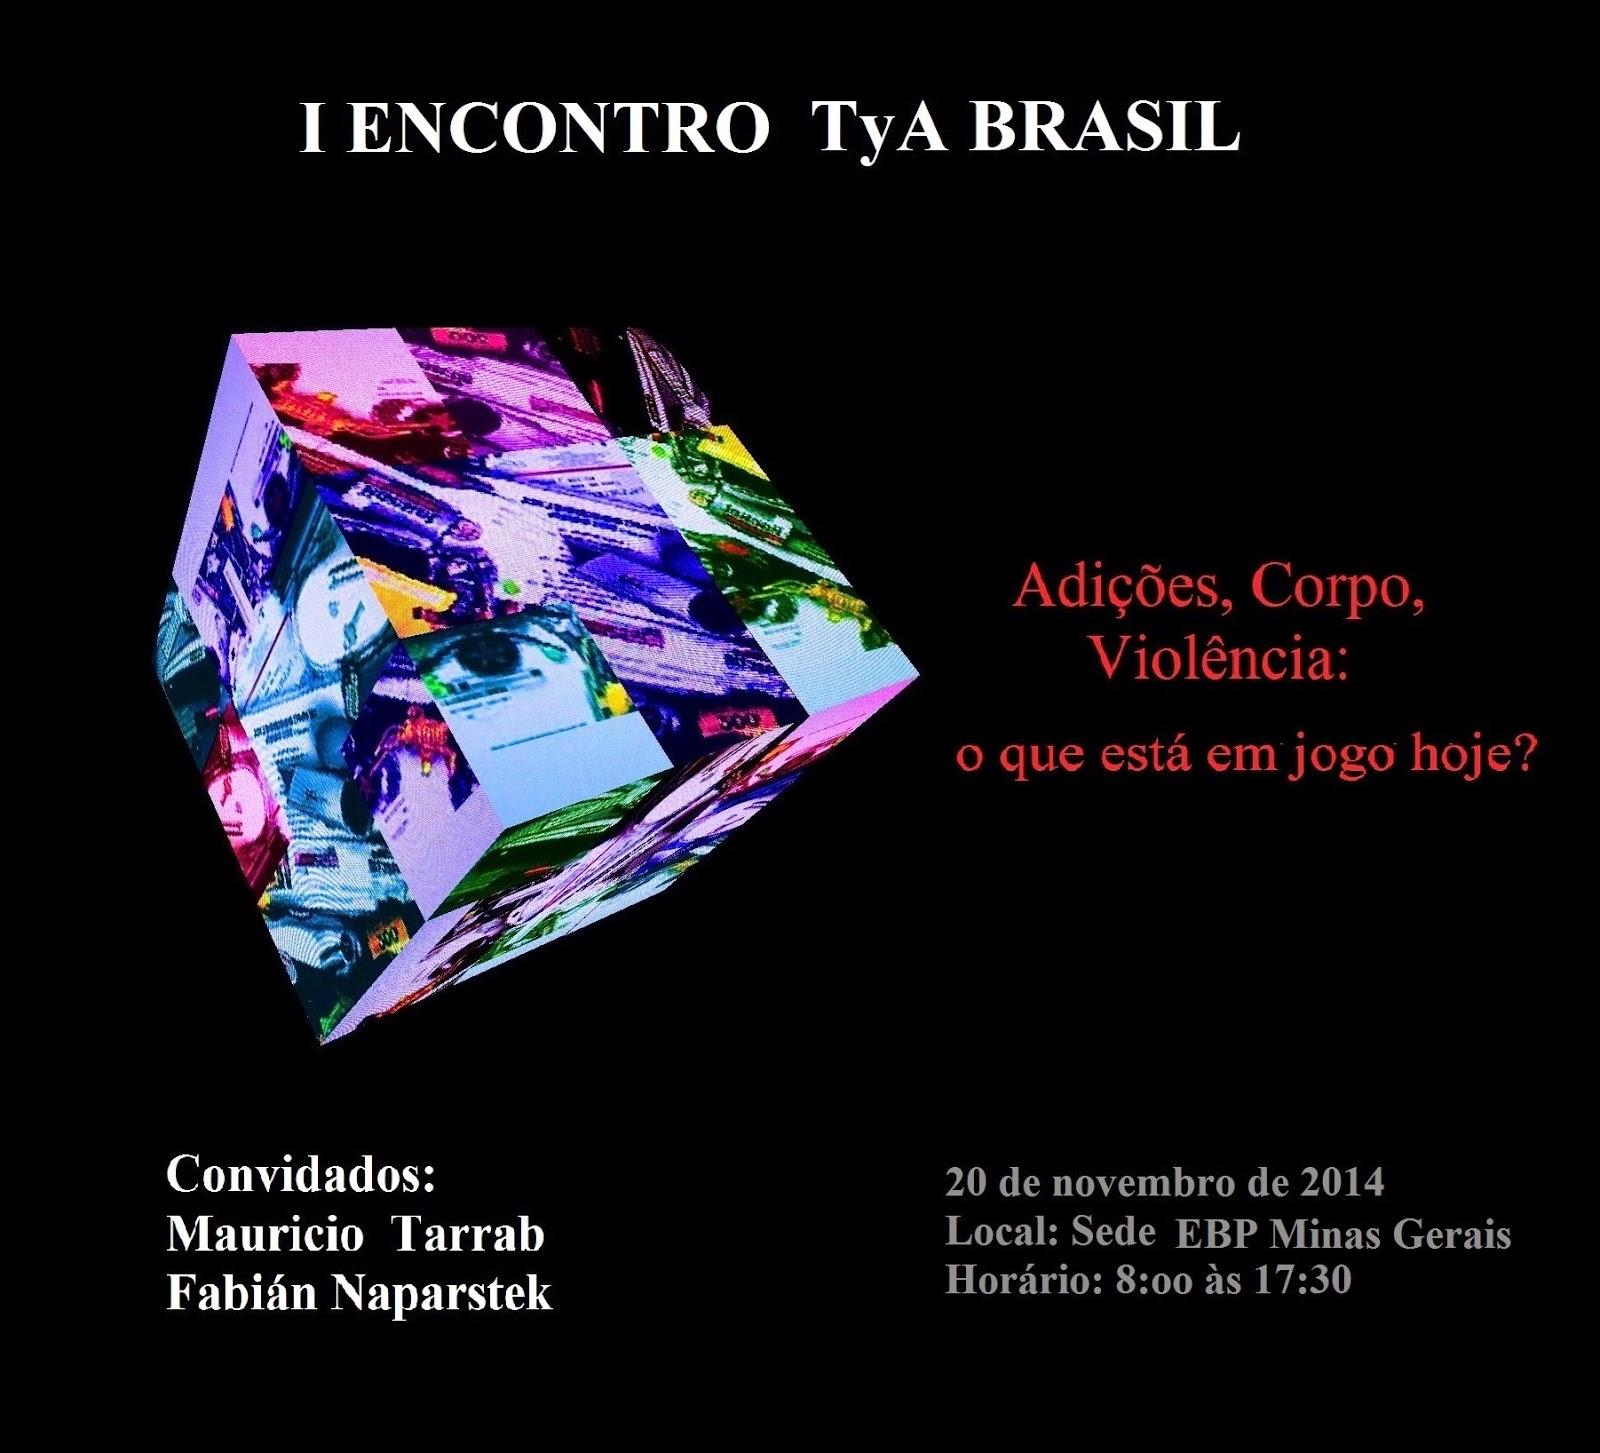 I Encontro da Rede Toxicomania e Alcolismo (TyA) Brasil